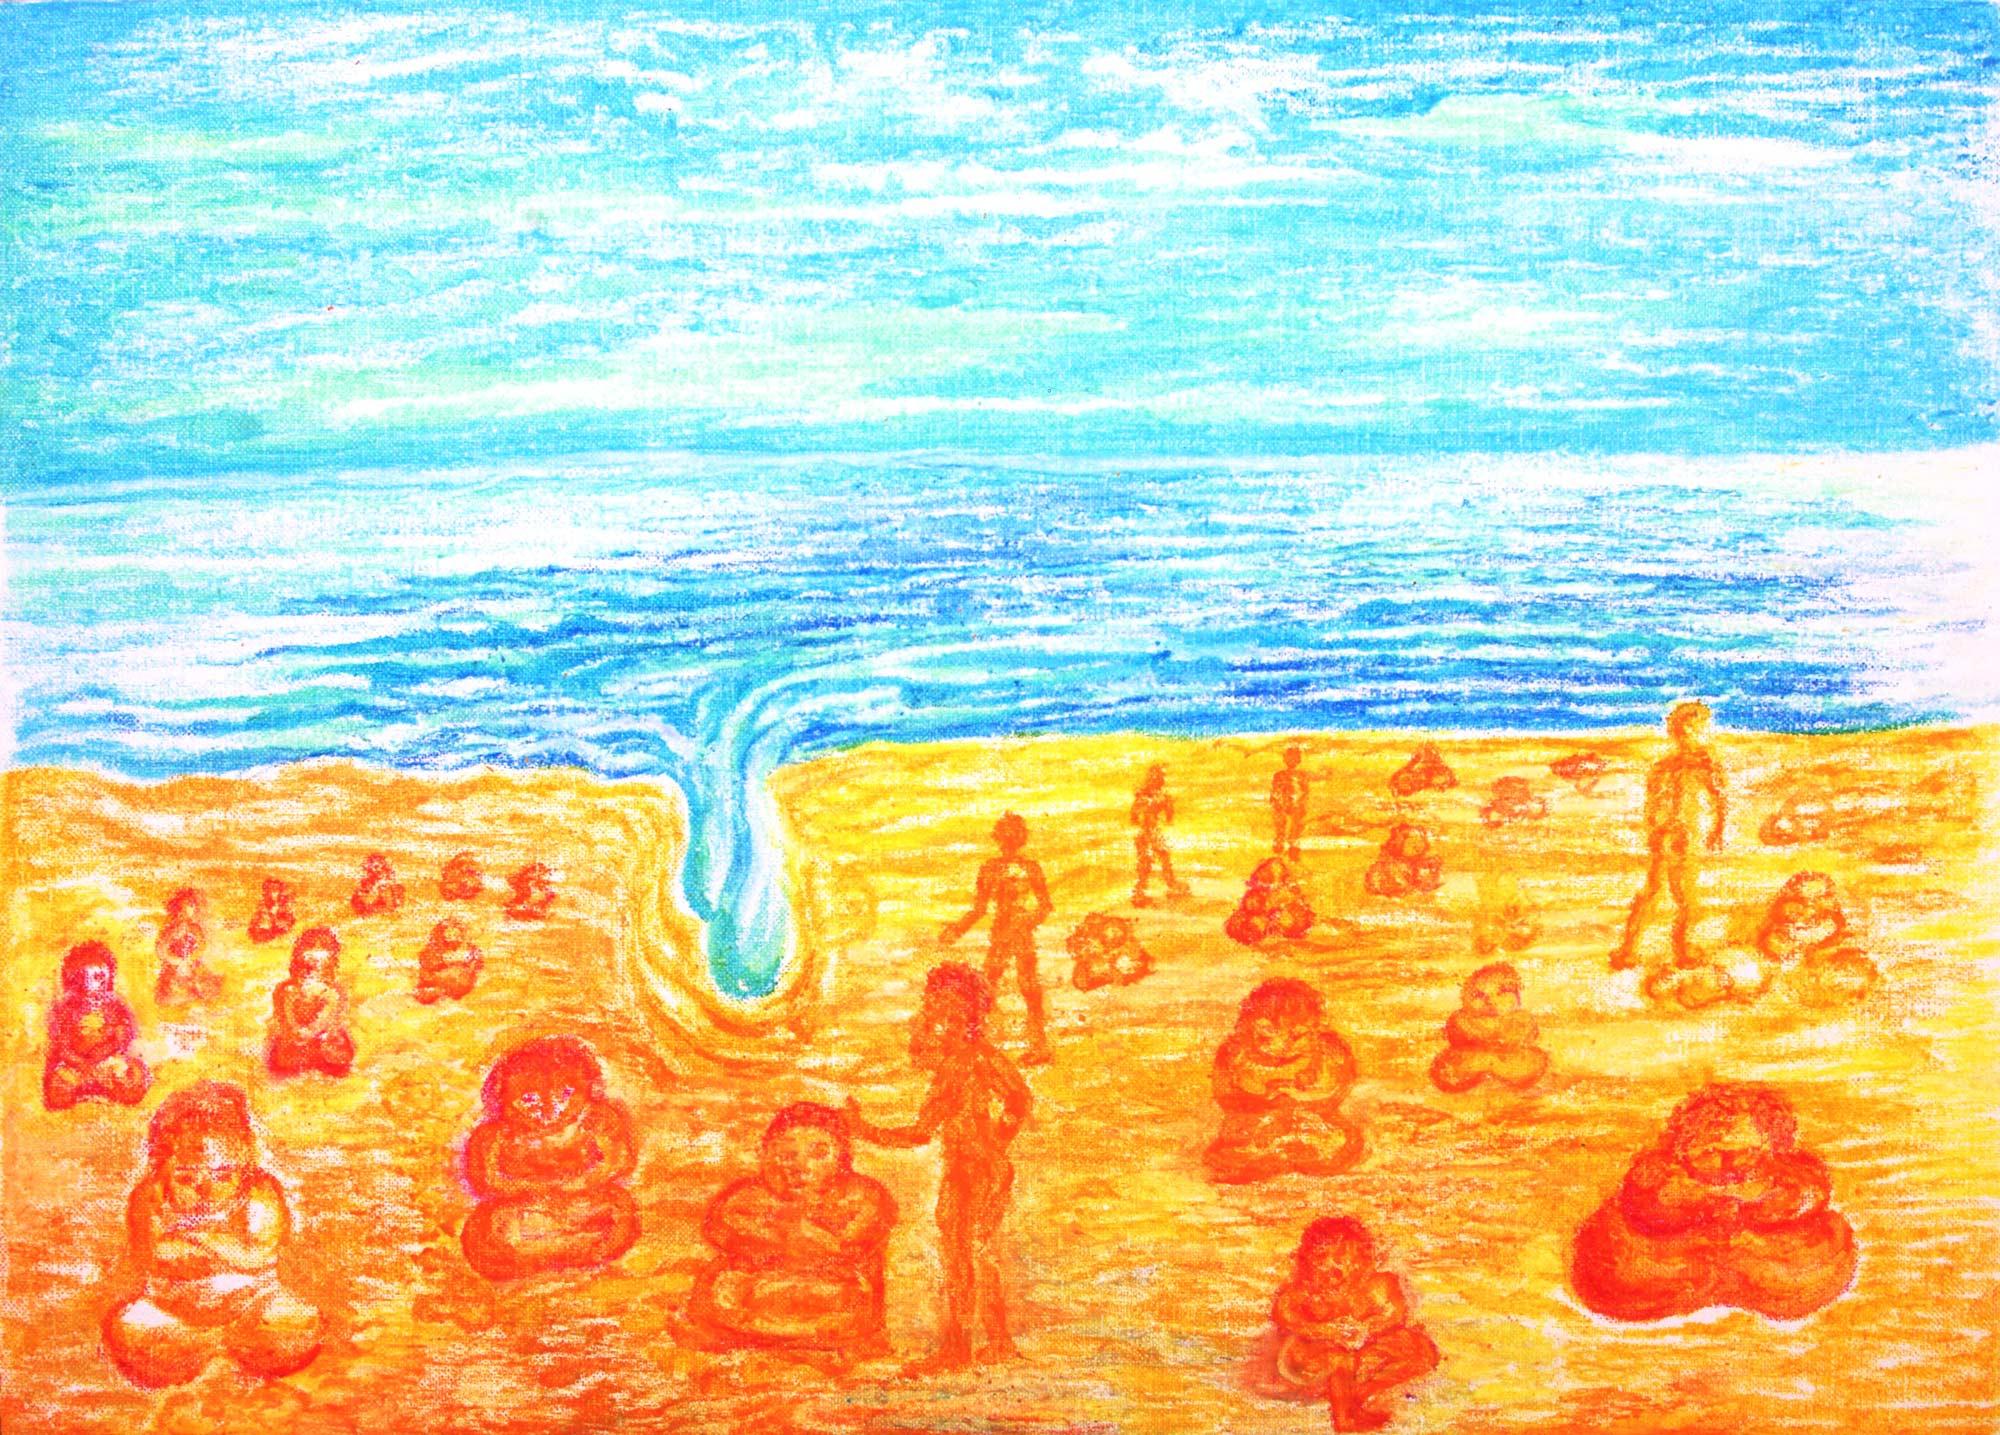 uddhas am Strand, 1997, Ölpastell